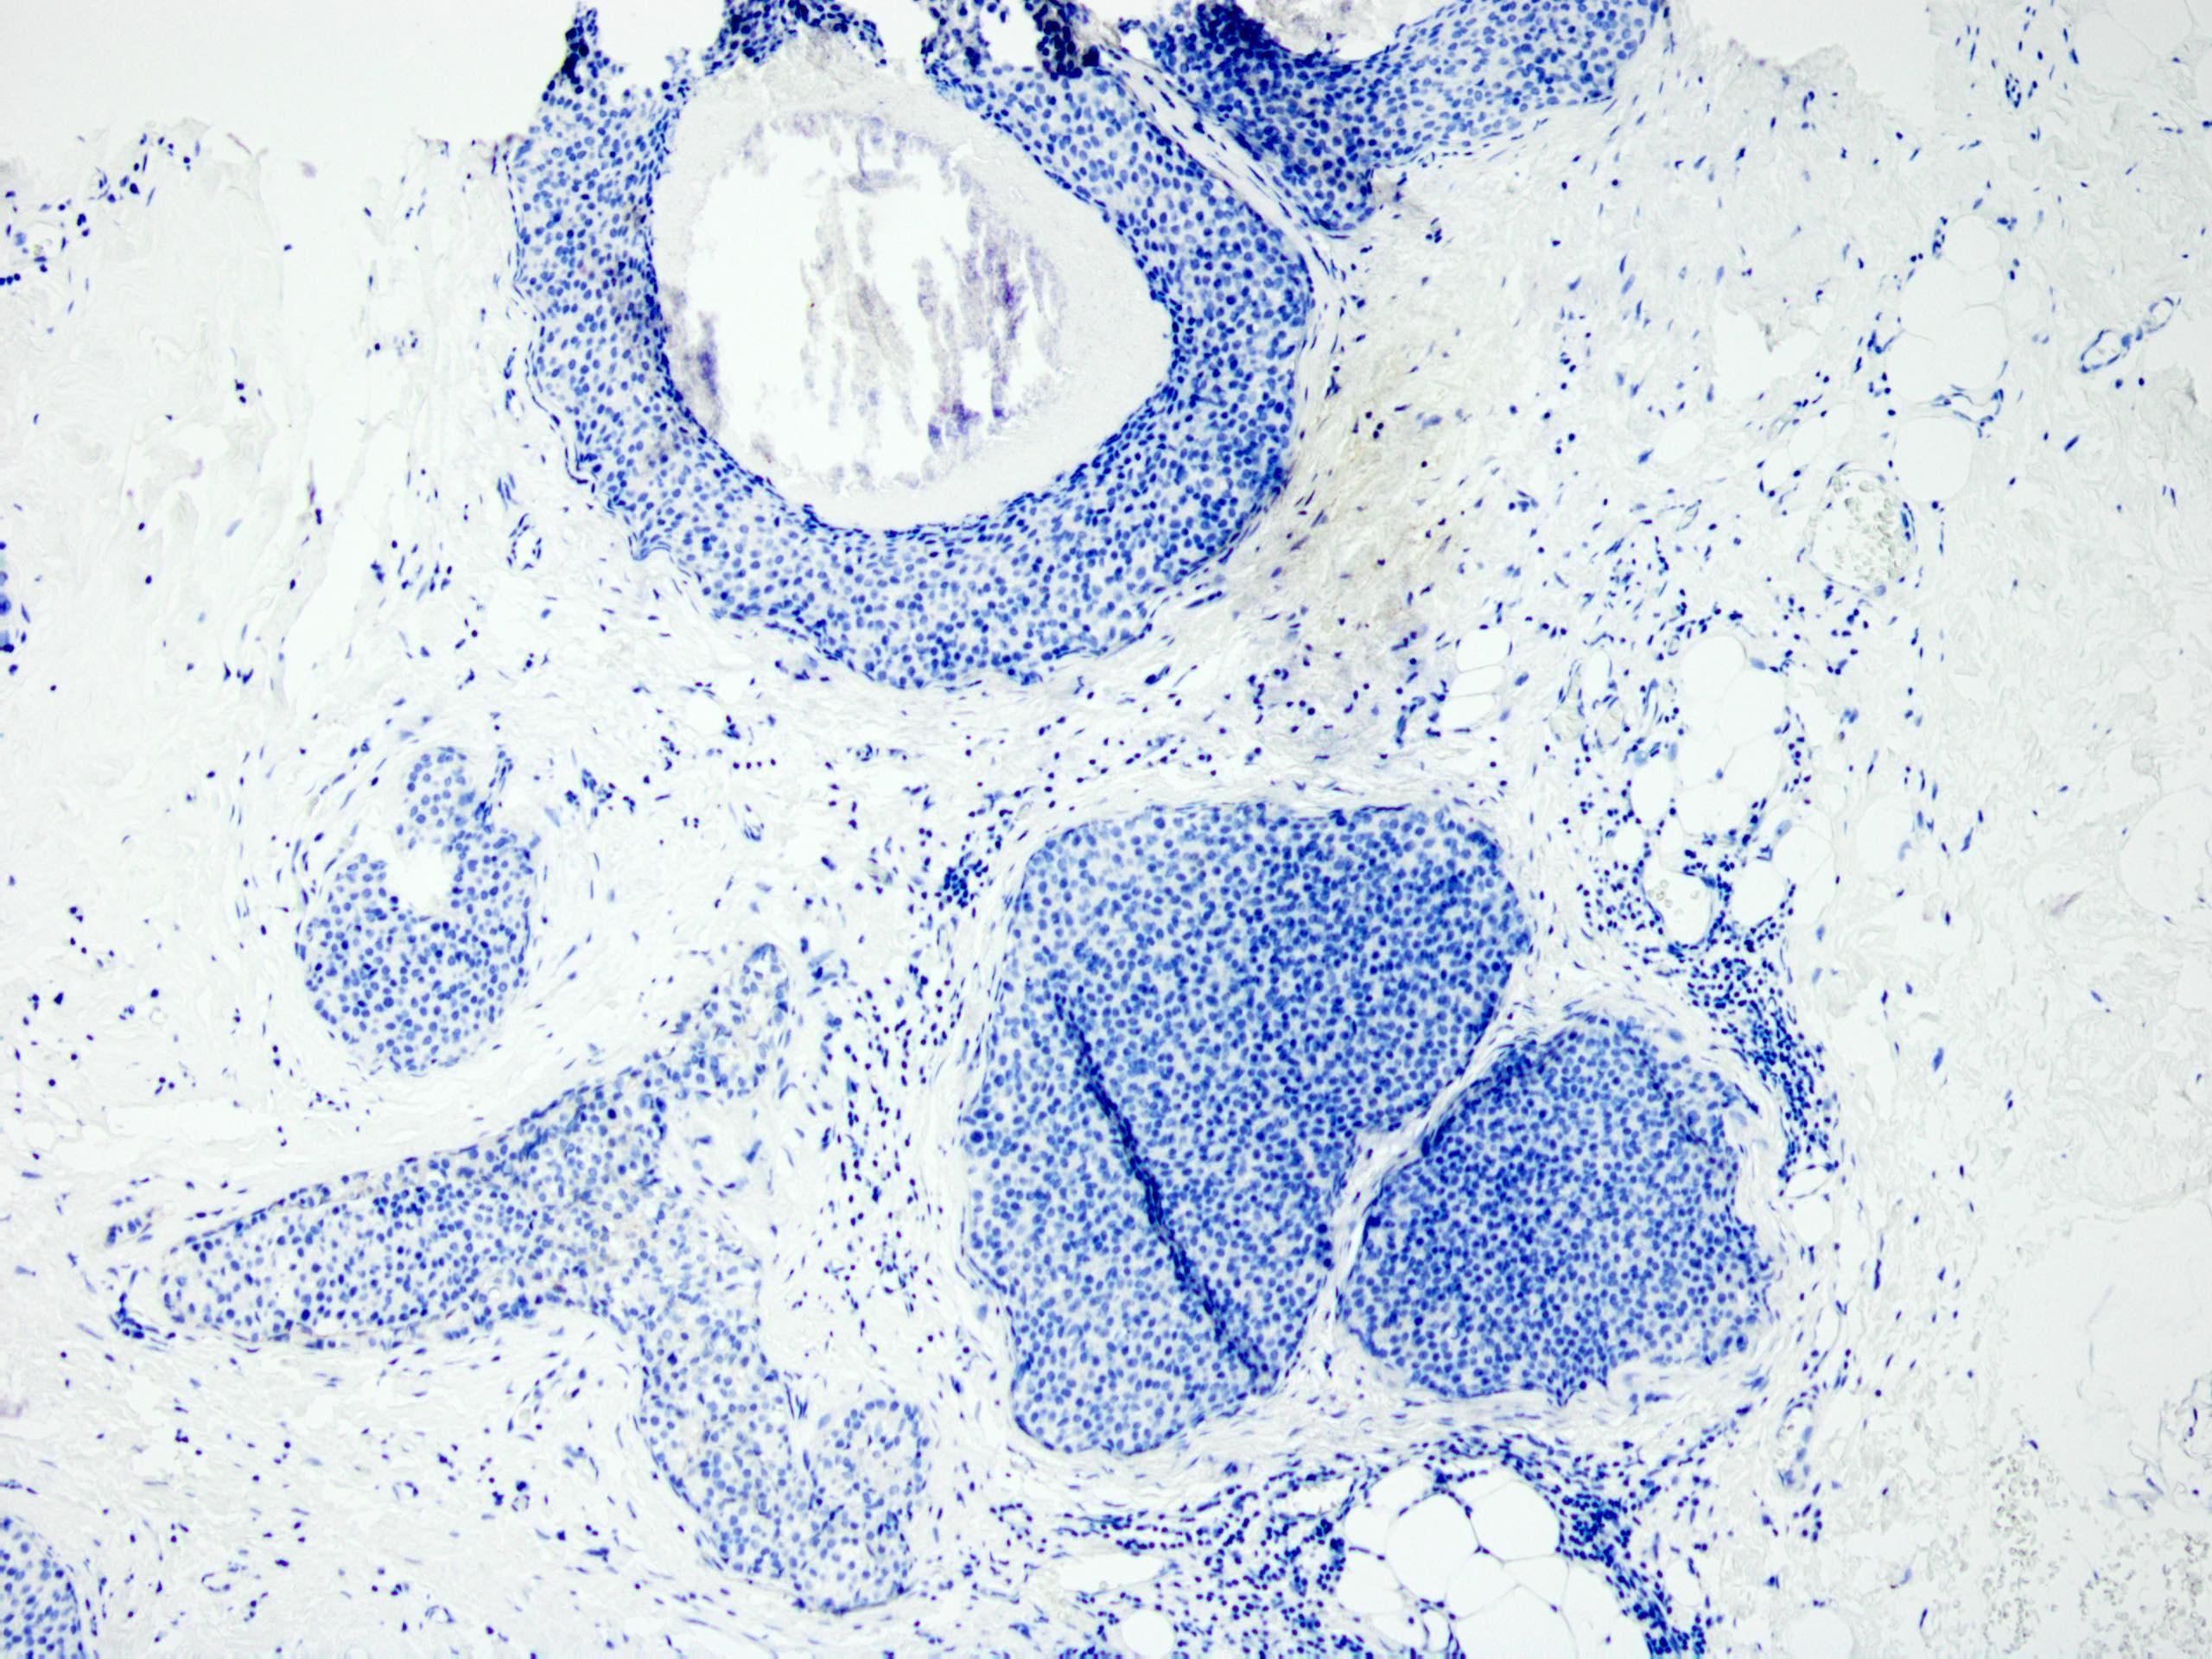 Florid lobular carcinoma in situ